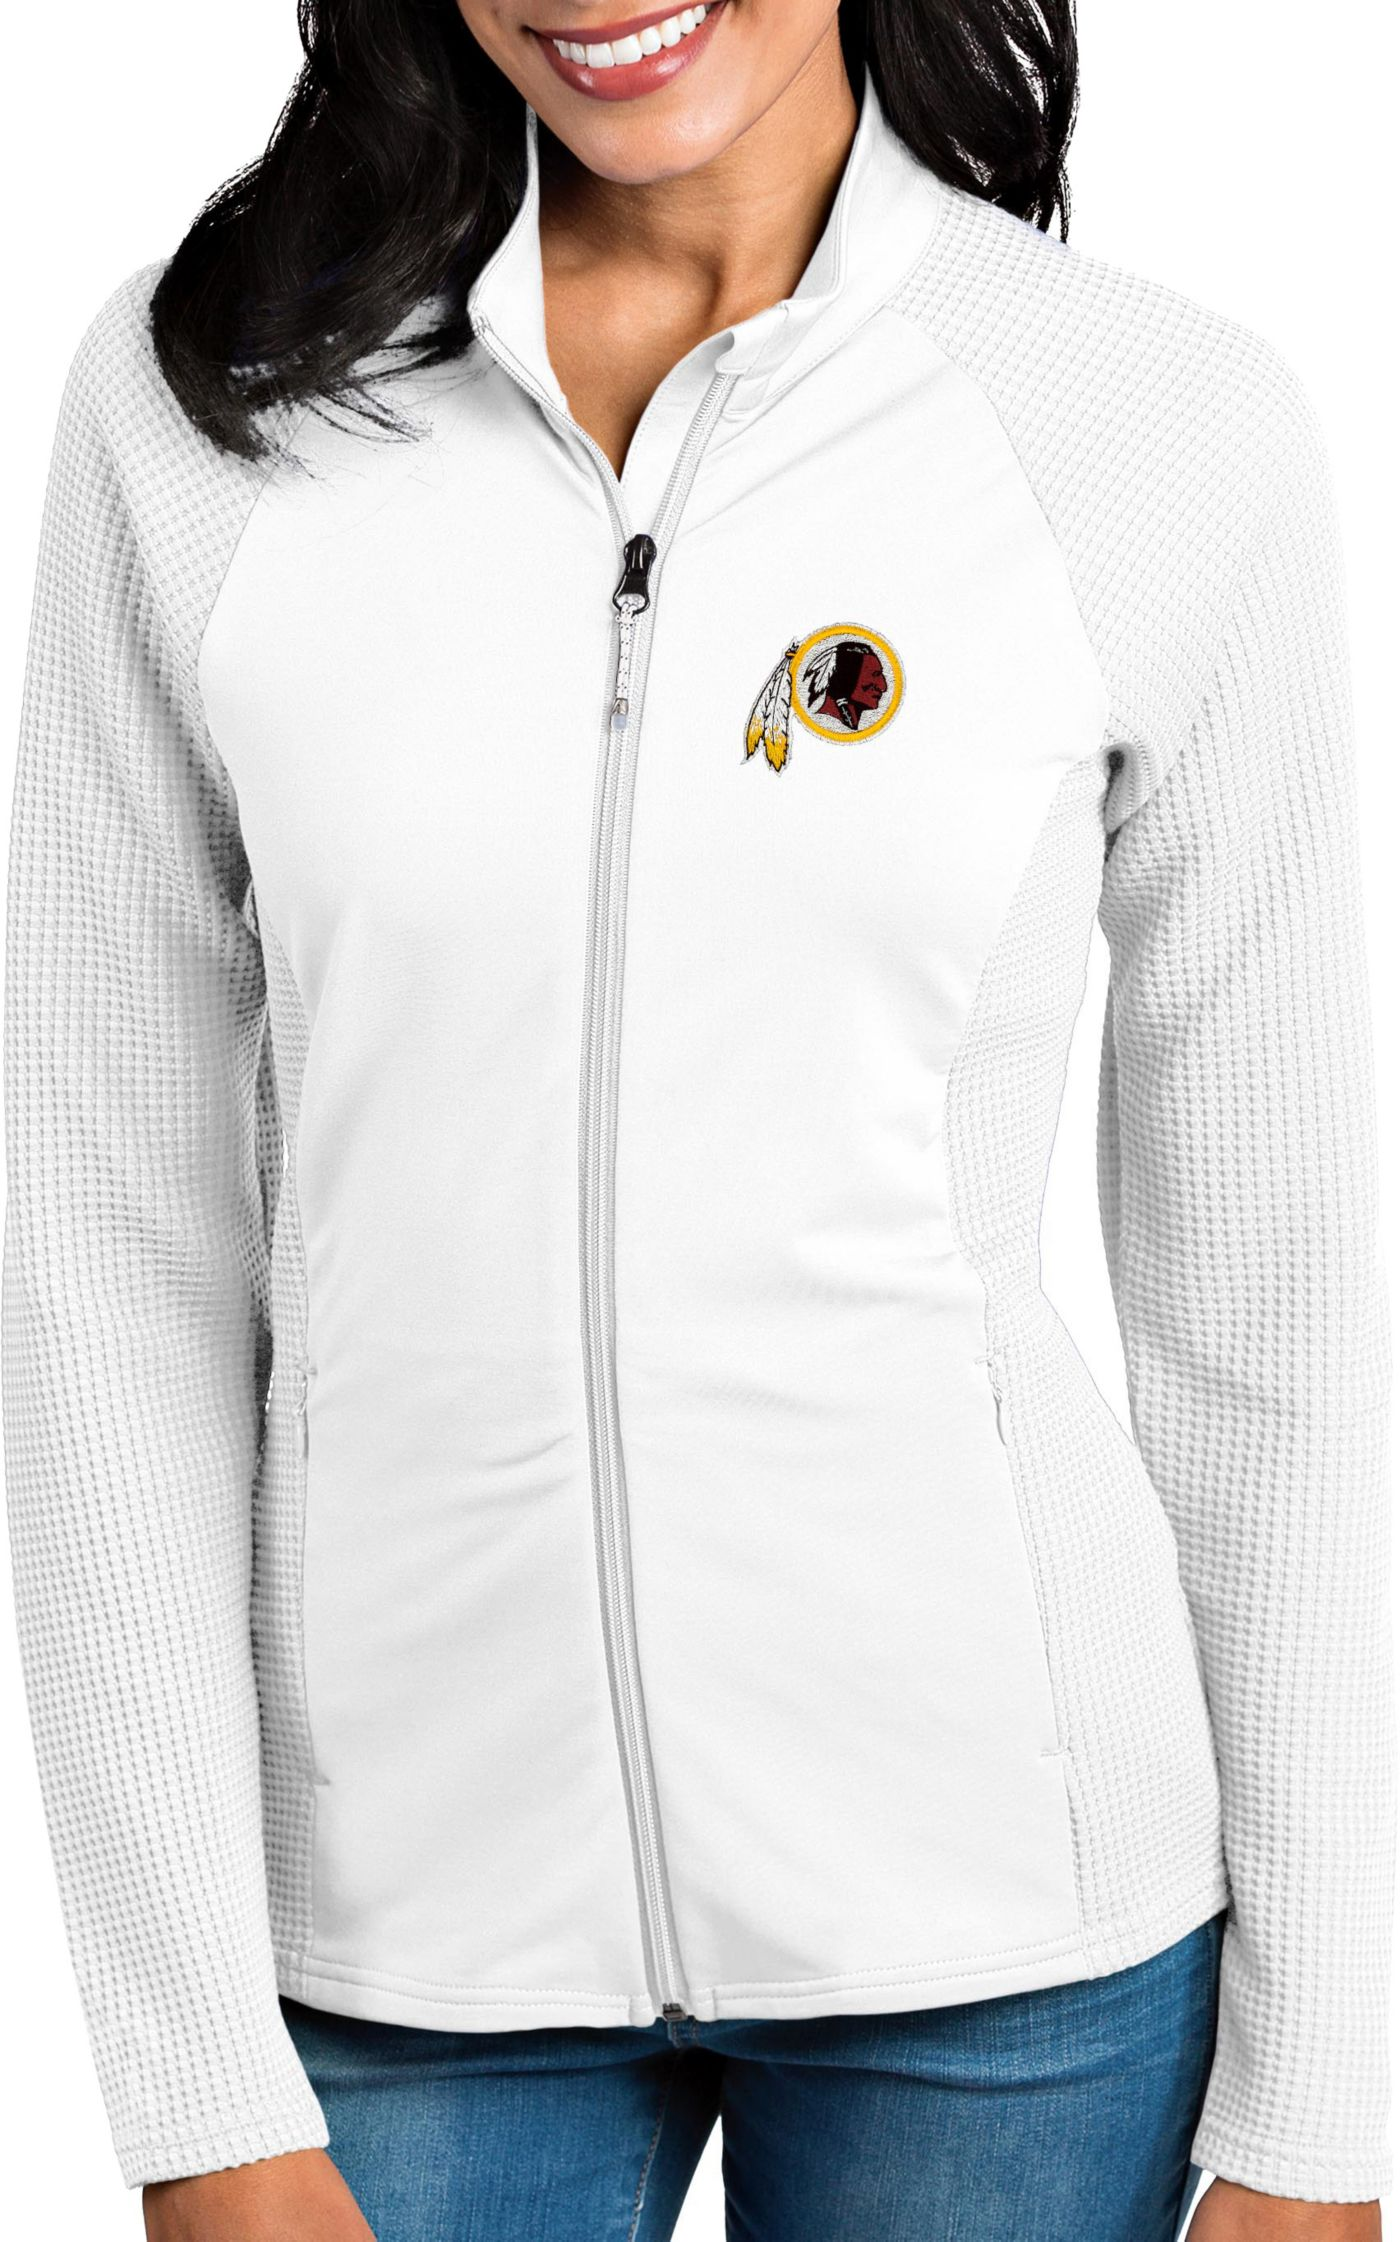 Antigua Women's Washington Redskins Sonar White Full-Zip Jacket